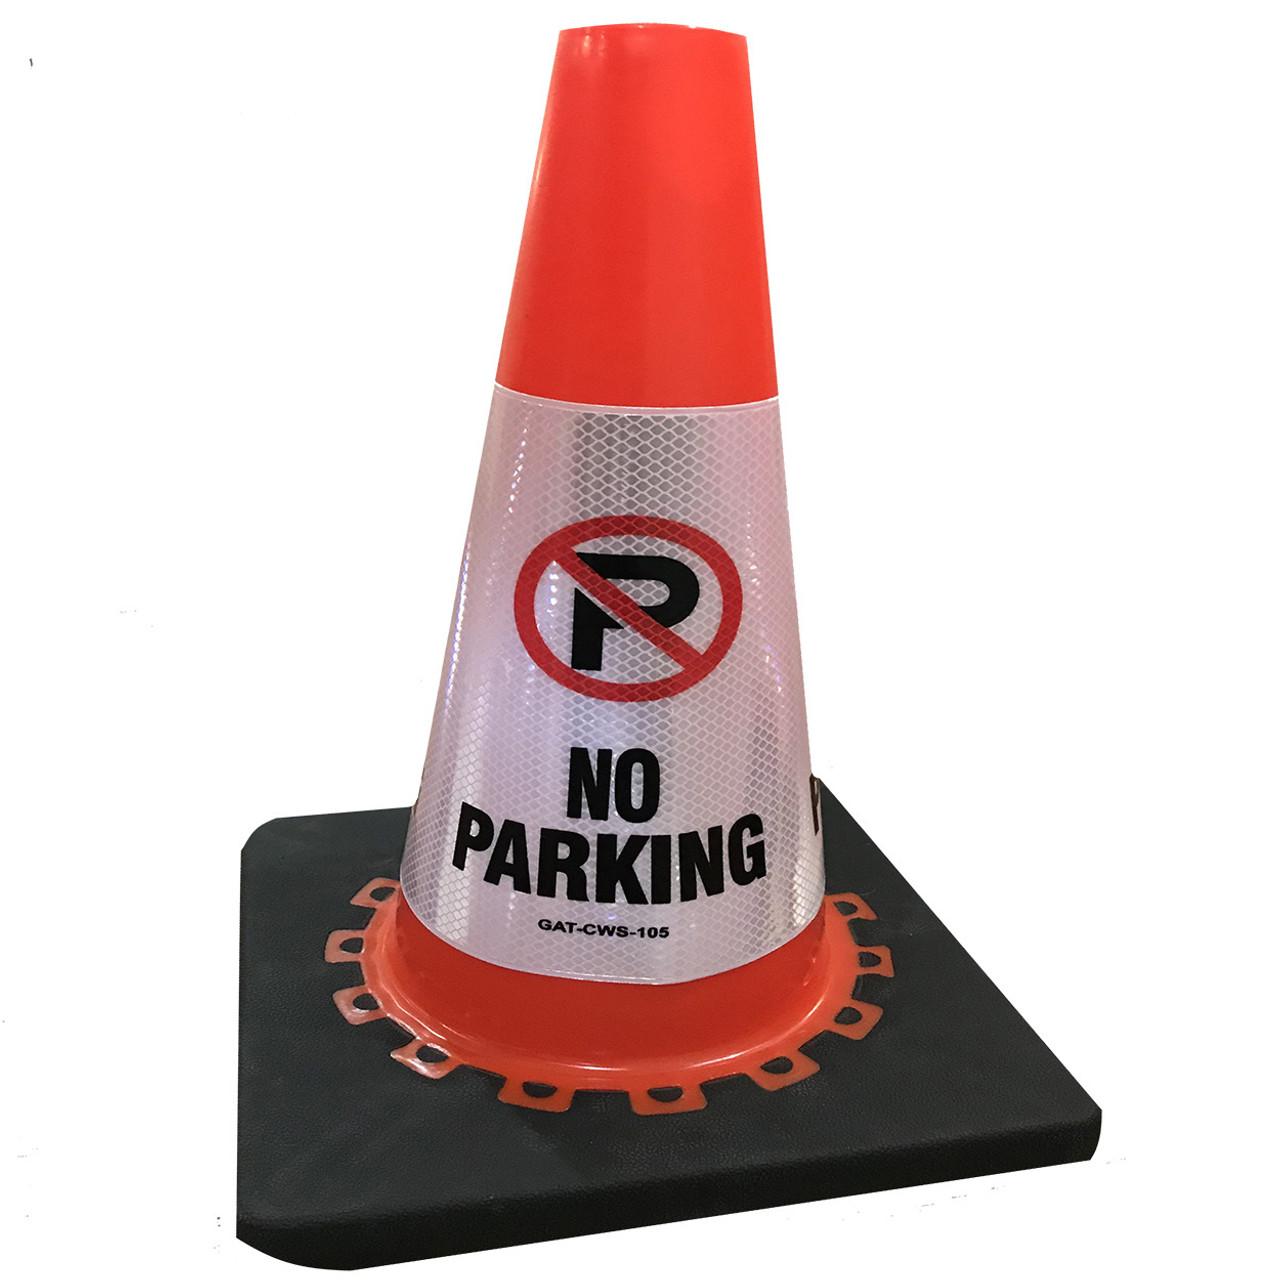 No parking Safety Cone Collar - Reflective-2